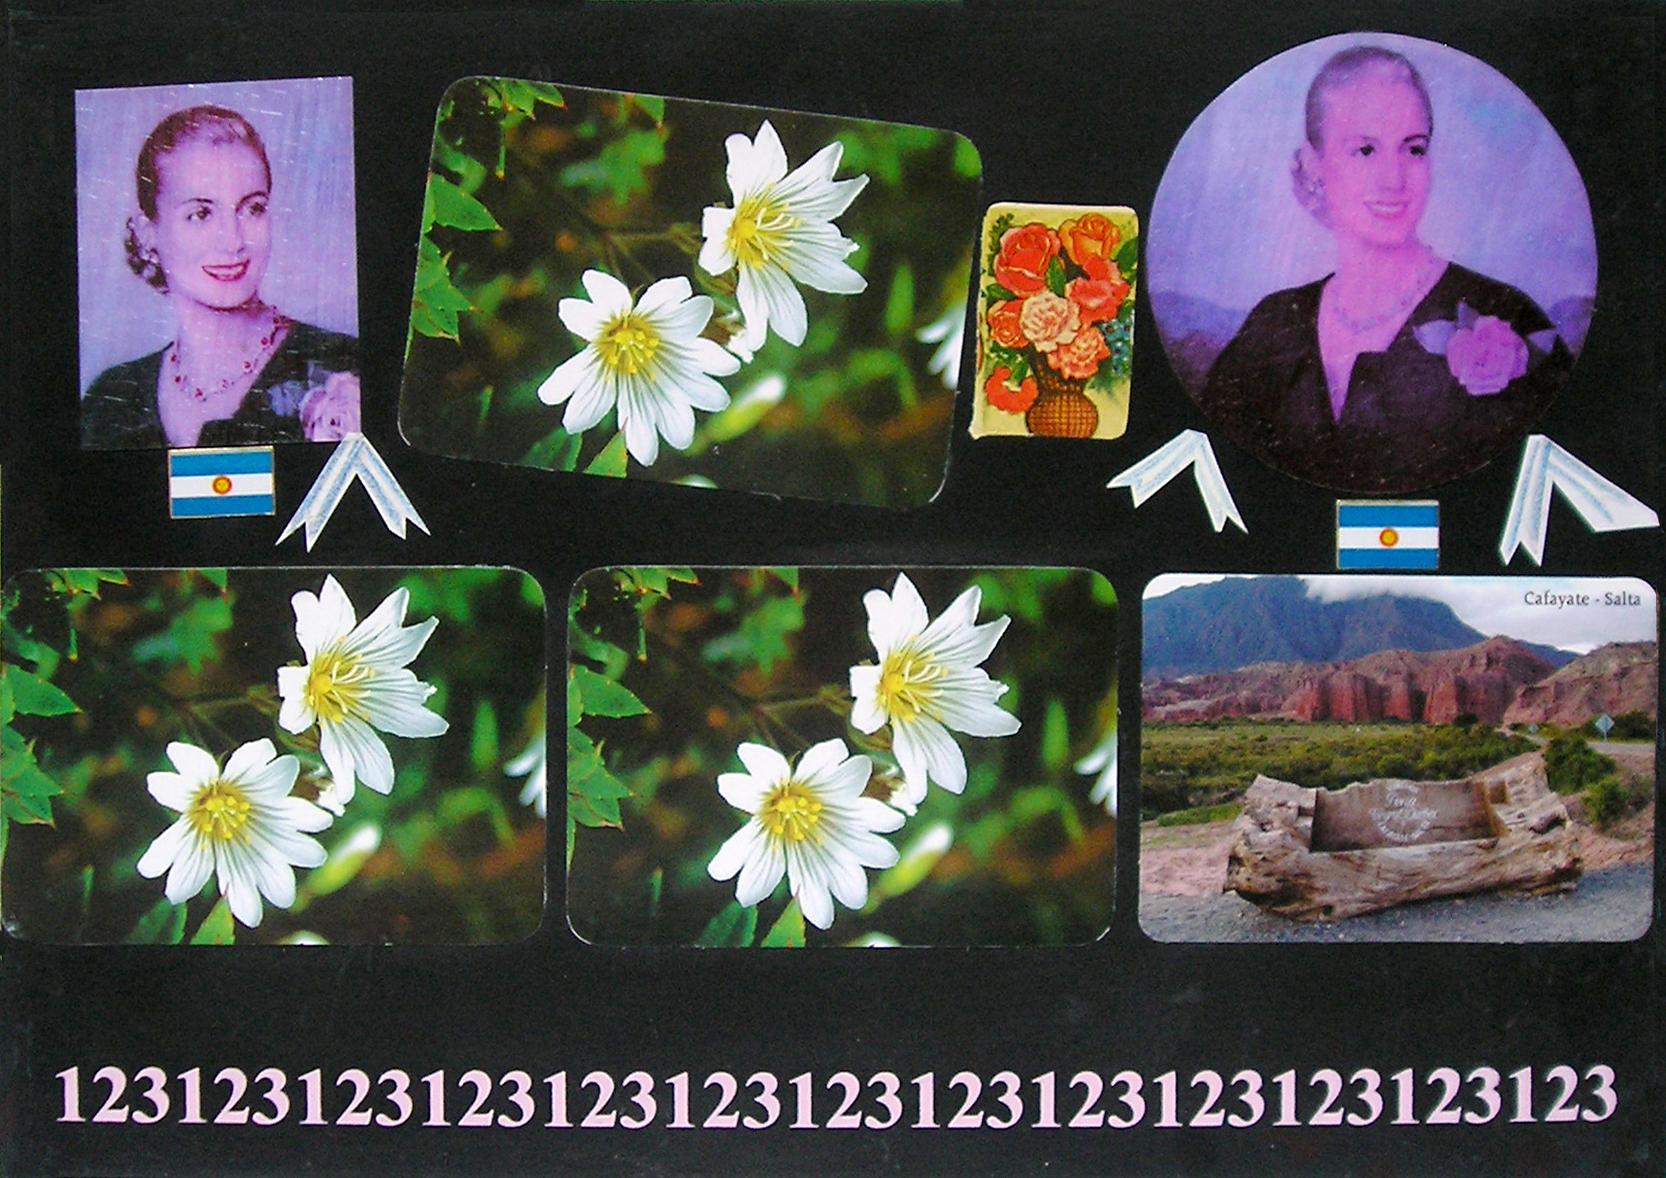 Evita Maestra recorre el país, Cafayate, Salta ; serie, técnica mixta sobre pizarrón; 21 x 30 cm, 2007